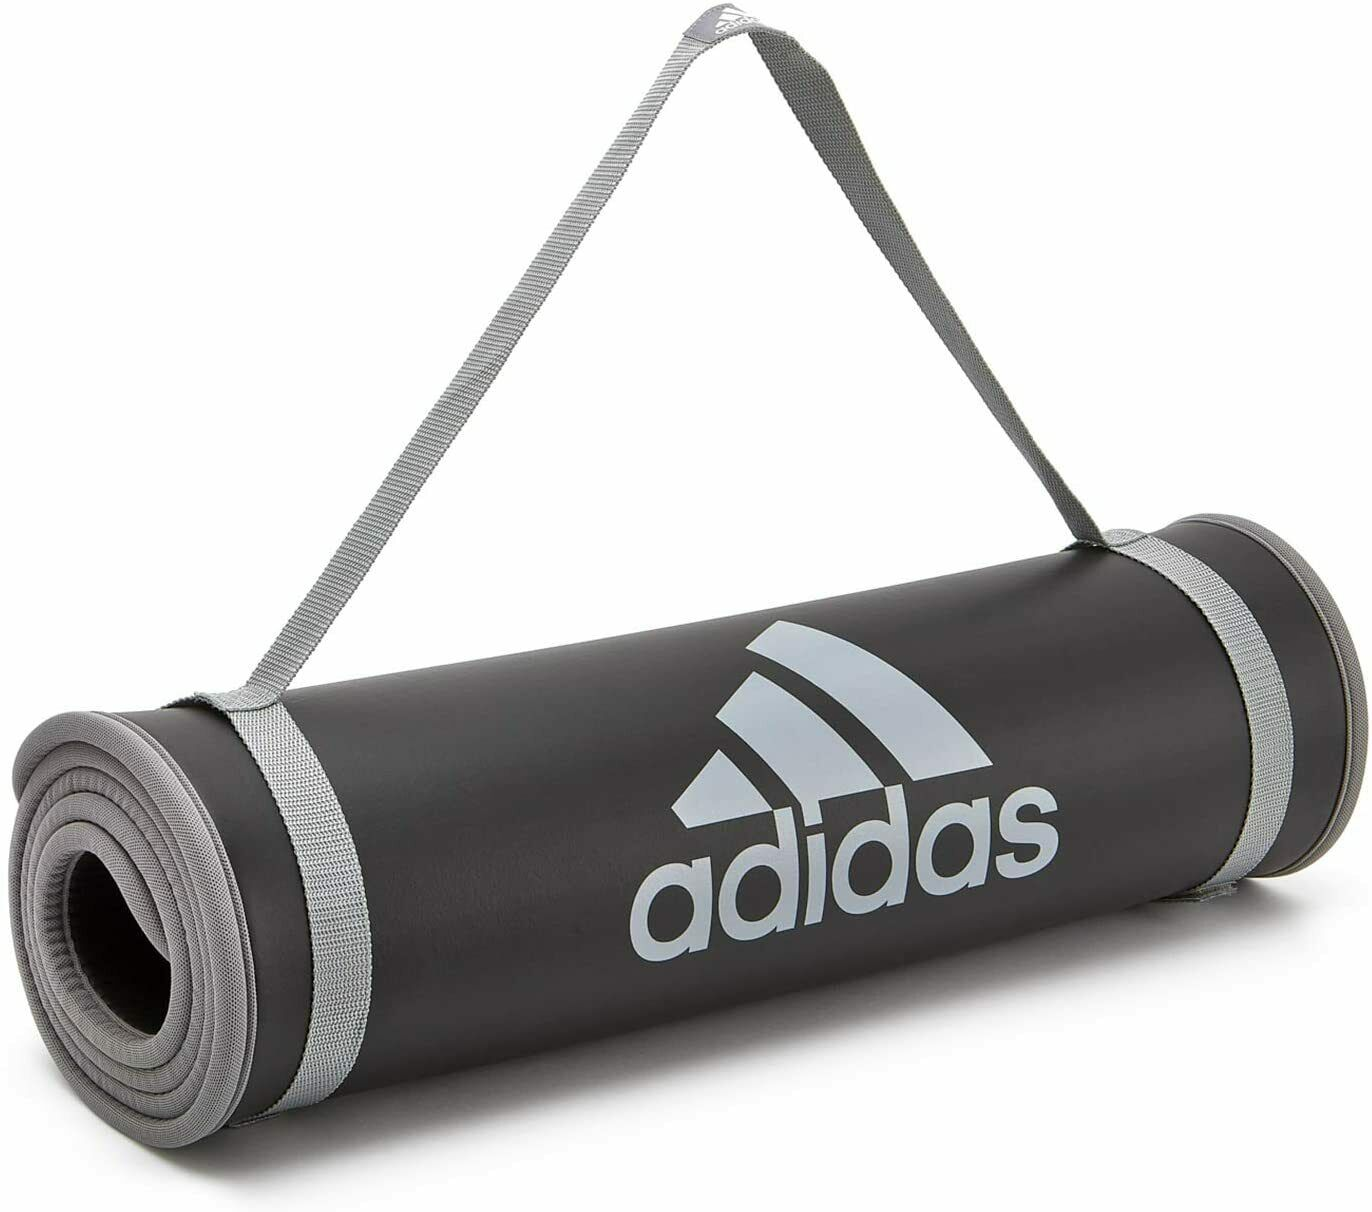 Adidas Esterilla de Entrenamiento para Hogar o Gimnasio 183x61x1 cm Reversible